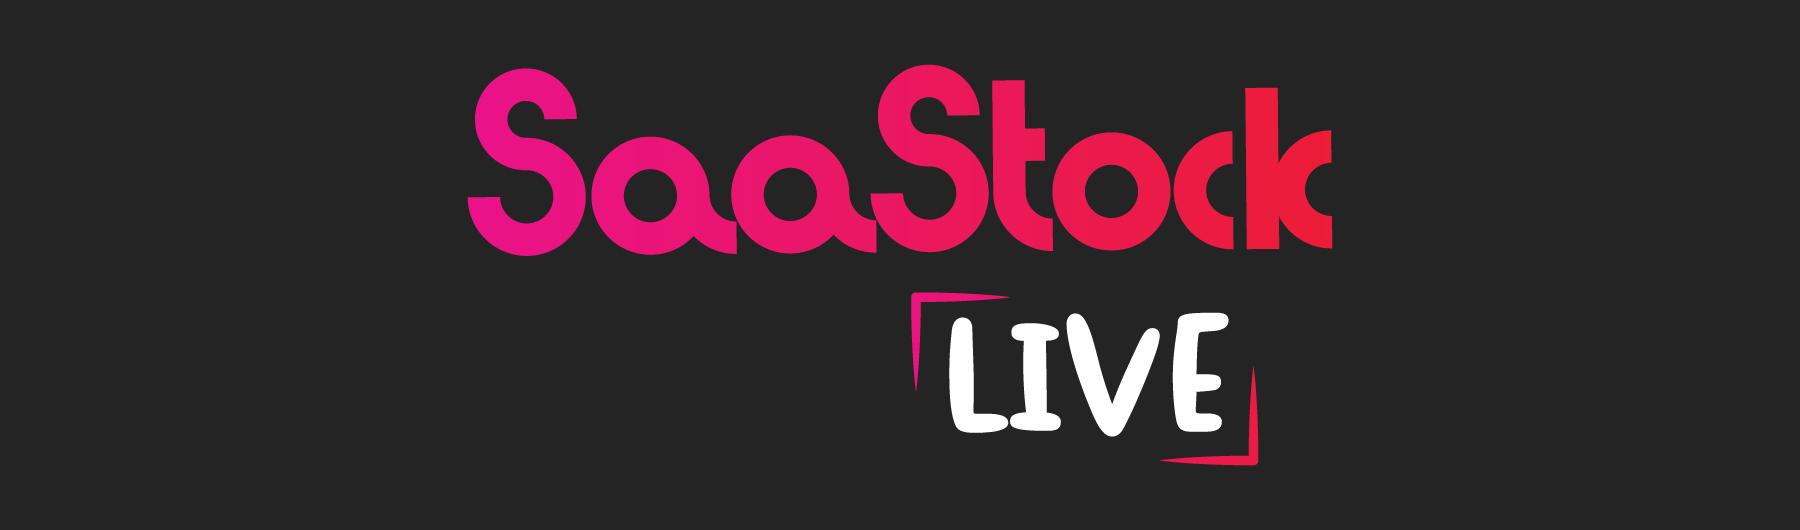 SaaStock18 Live